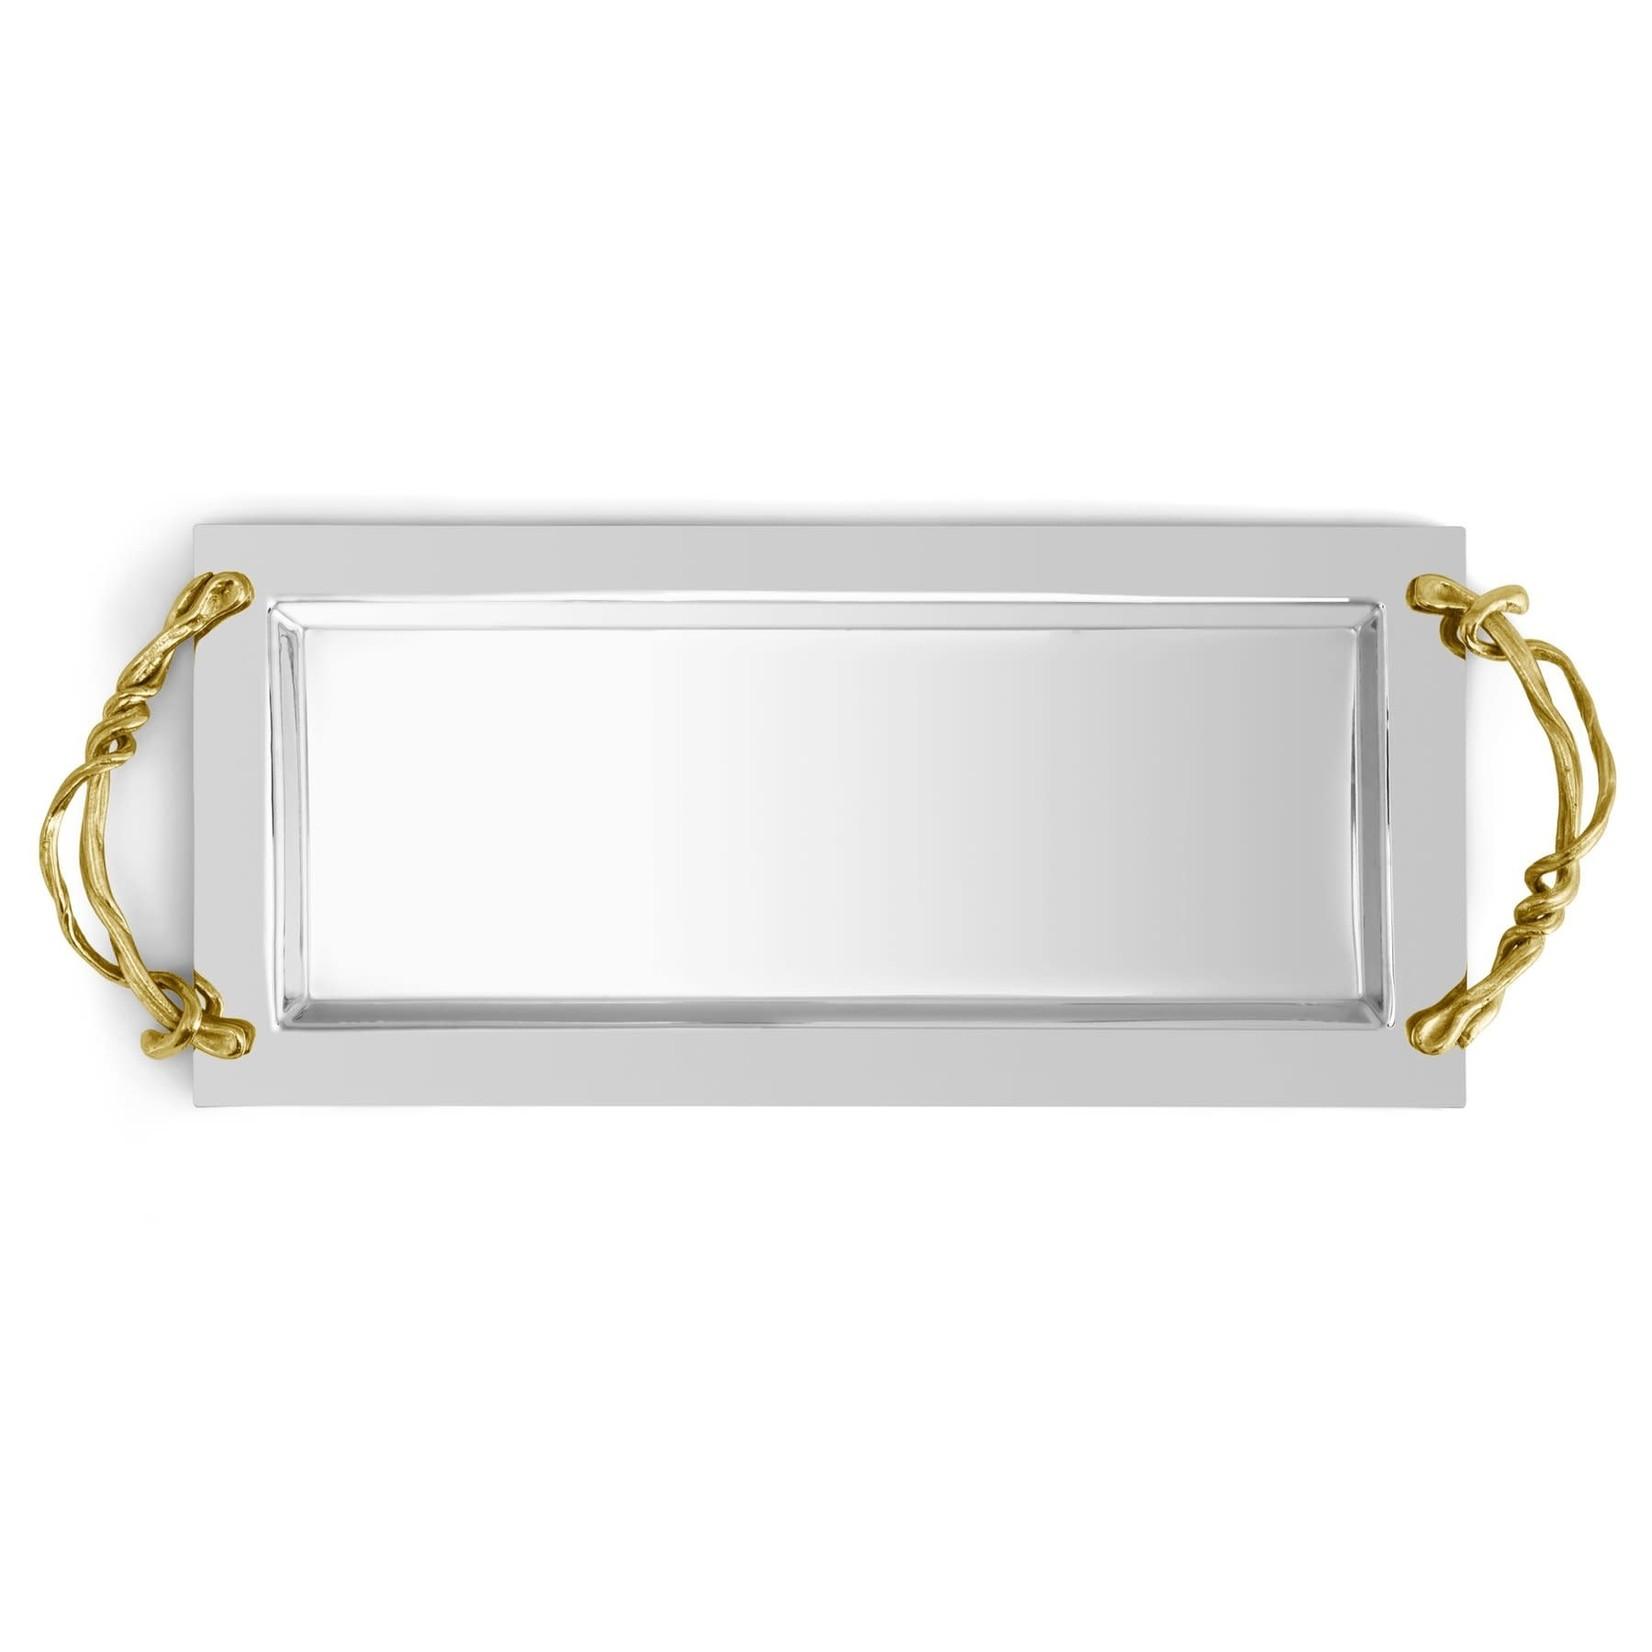 Michael Aram Wisteria Gold Vanity Tray